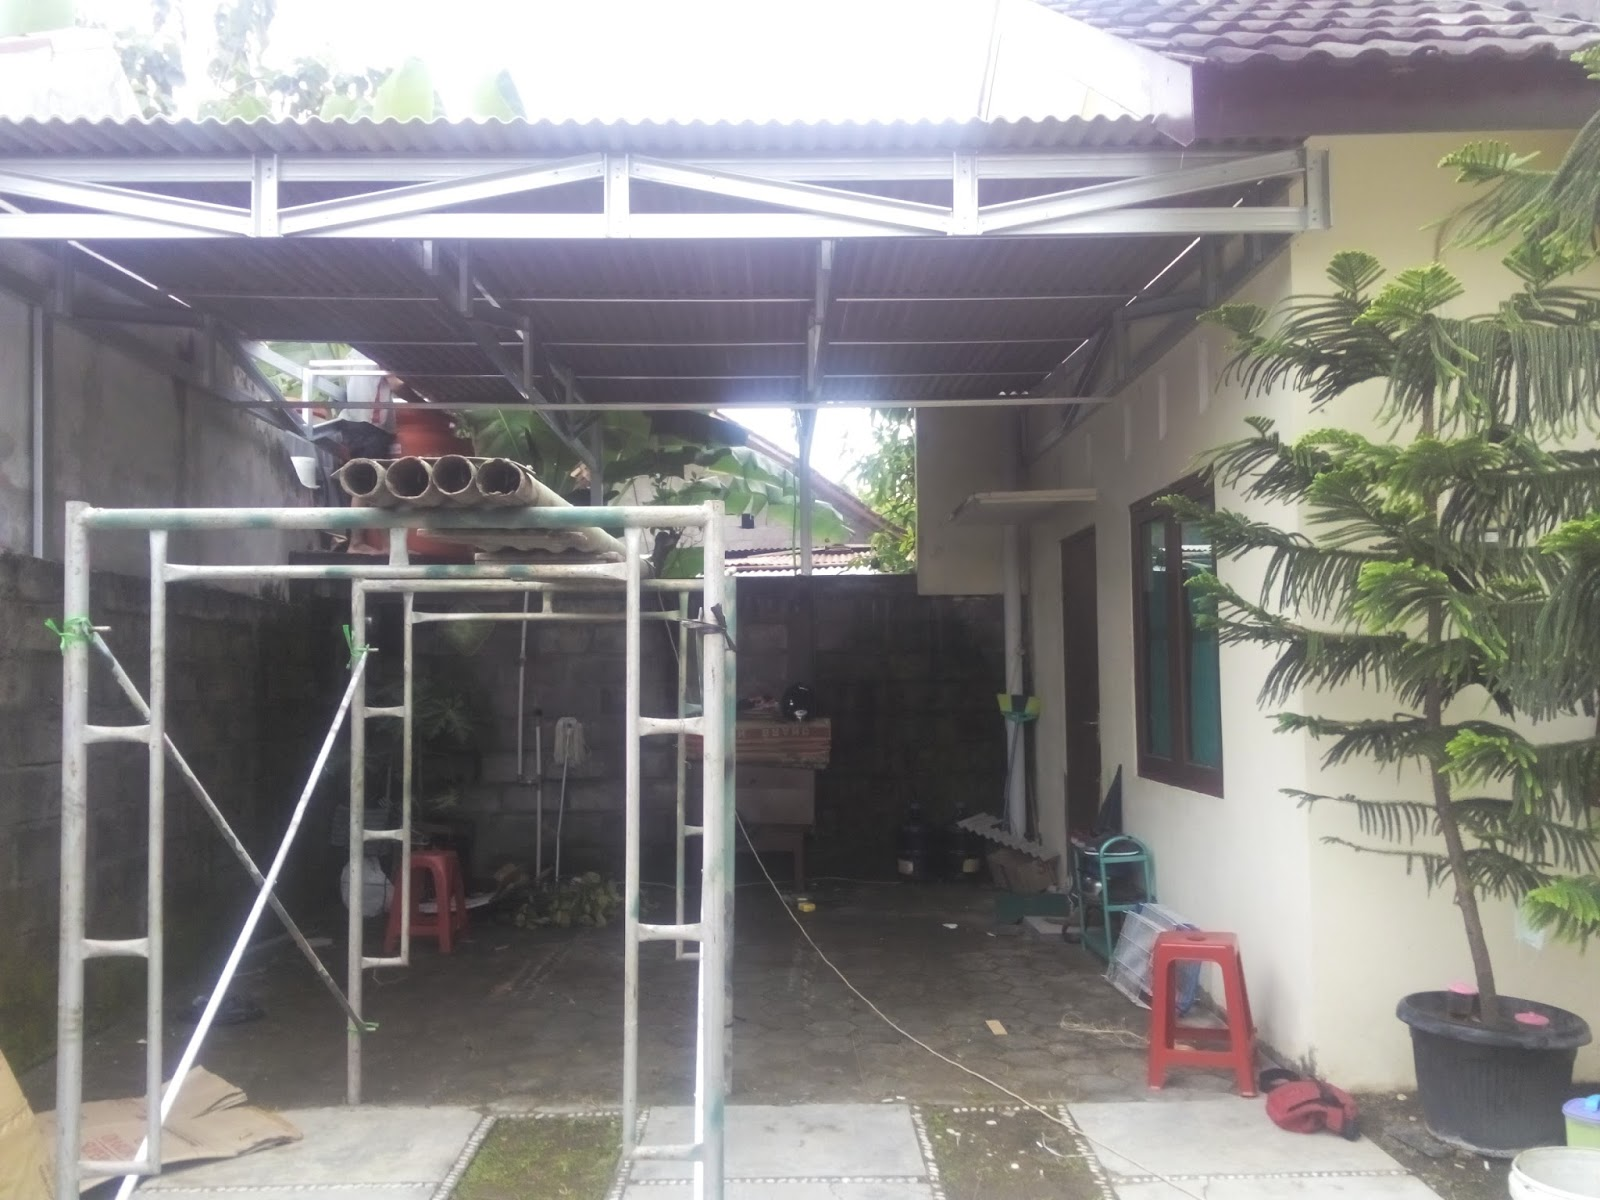 rangka kanopi jendela baja ringan pemasangan atap asbes - aditya ...